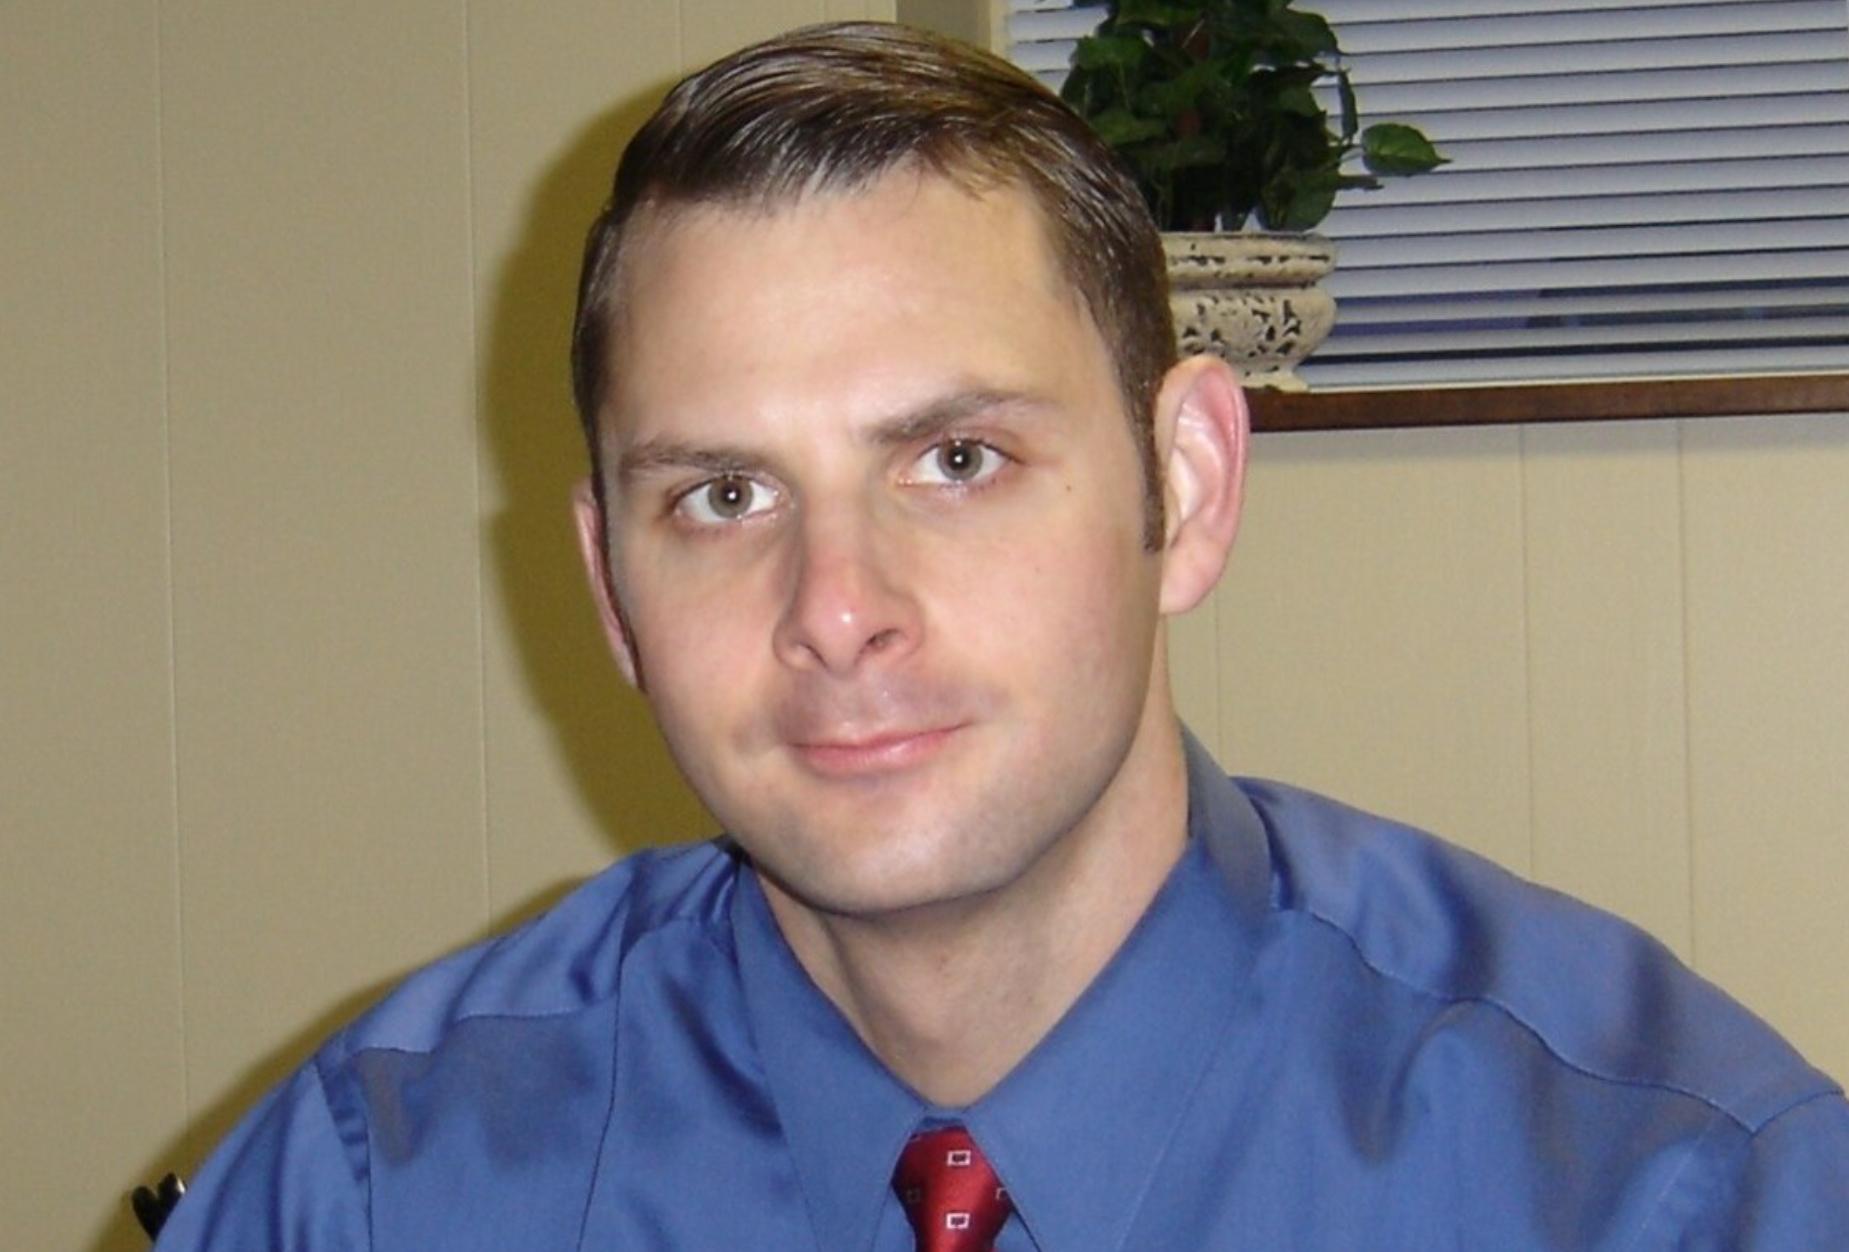 Peter Debbins